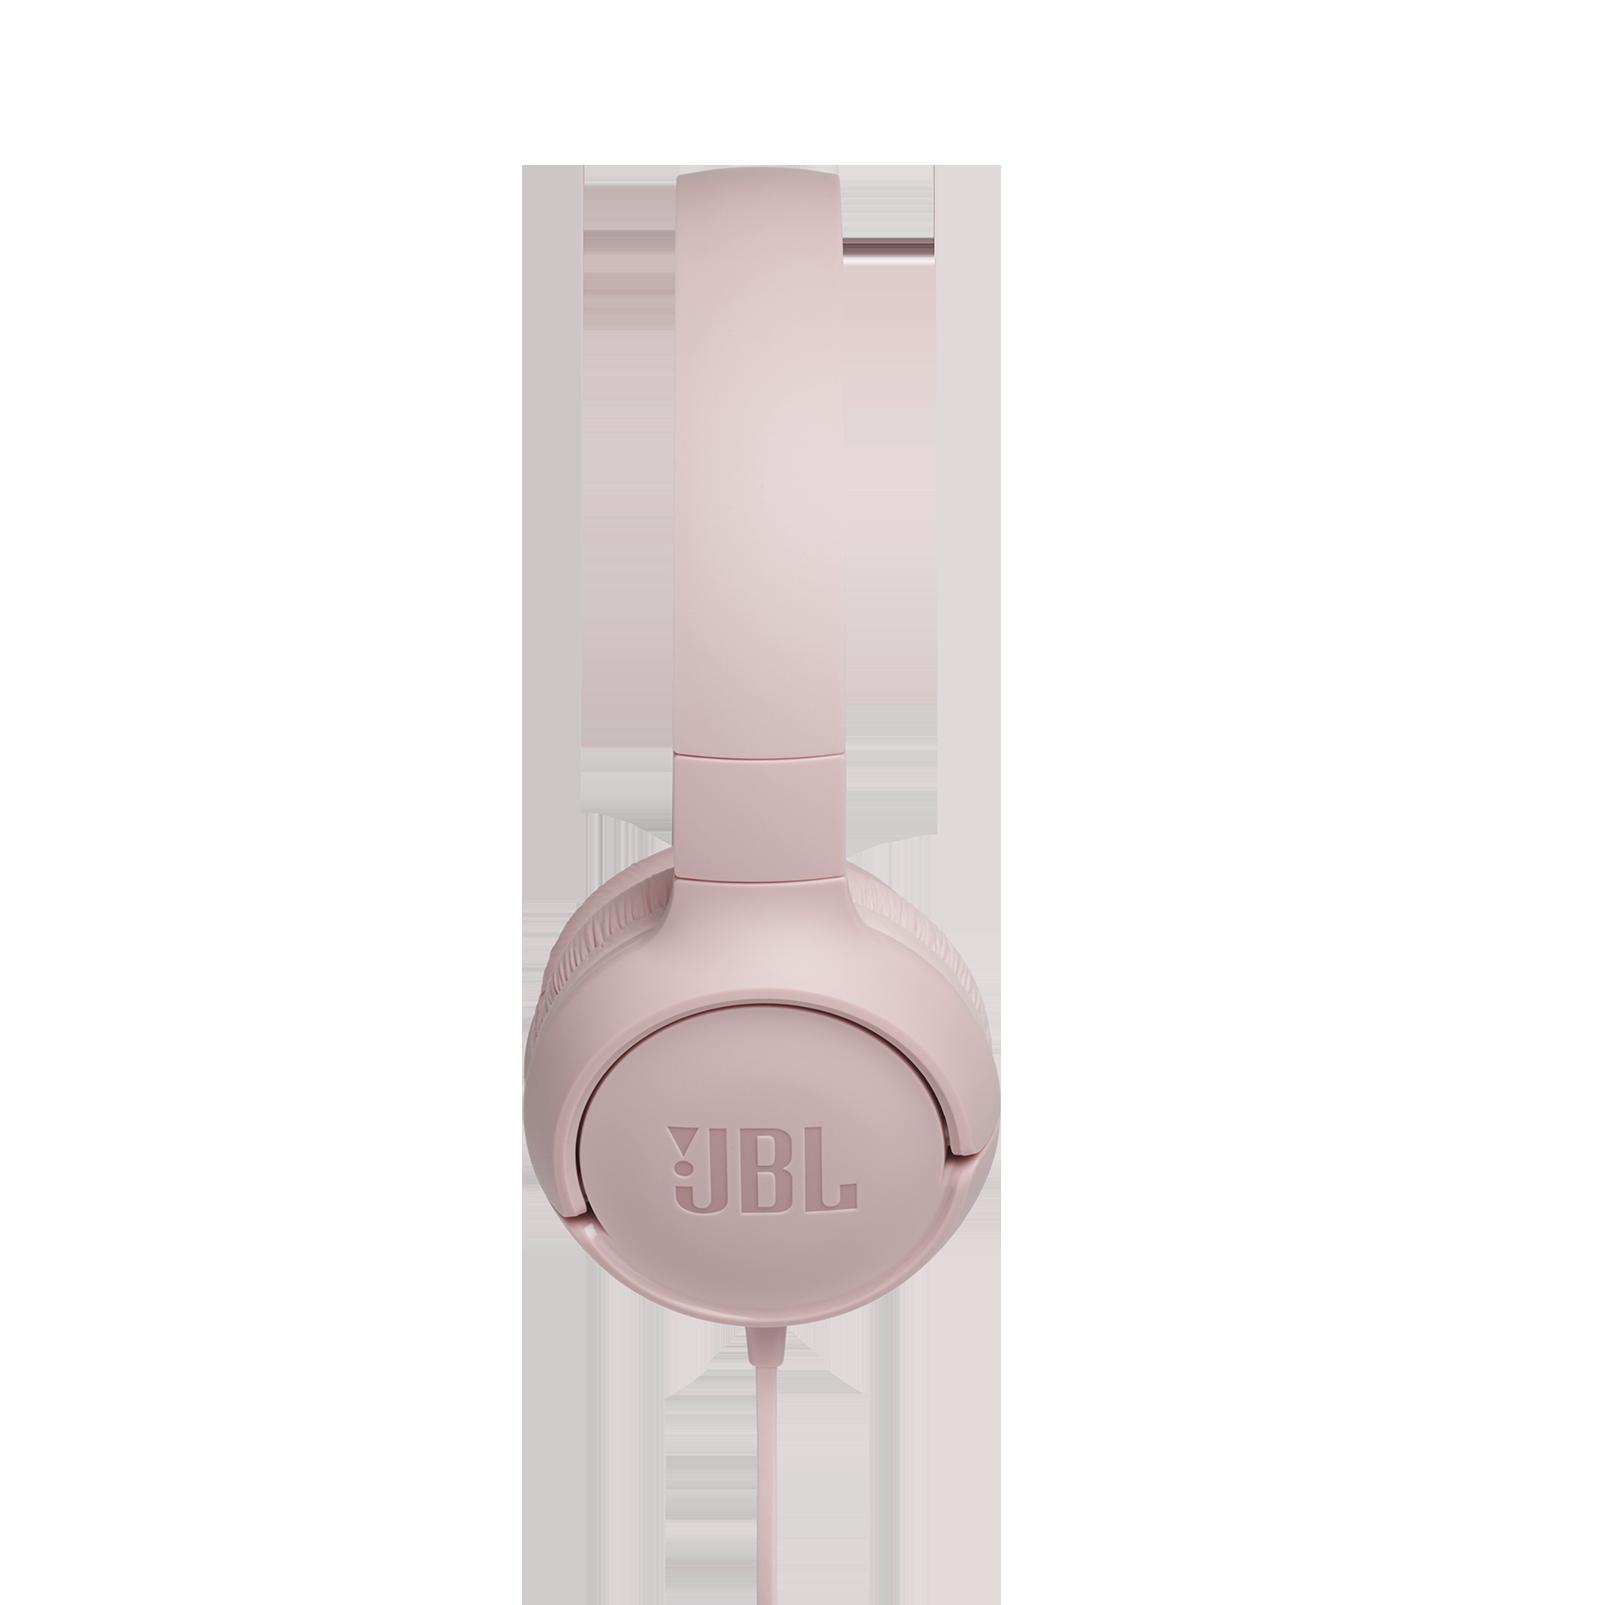 JBL TUNE 500 - Pink - Wired on-ear headphones - Detailshot 2